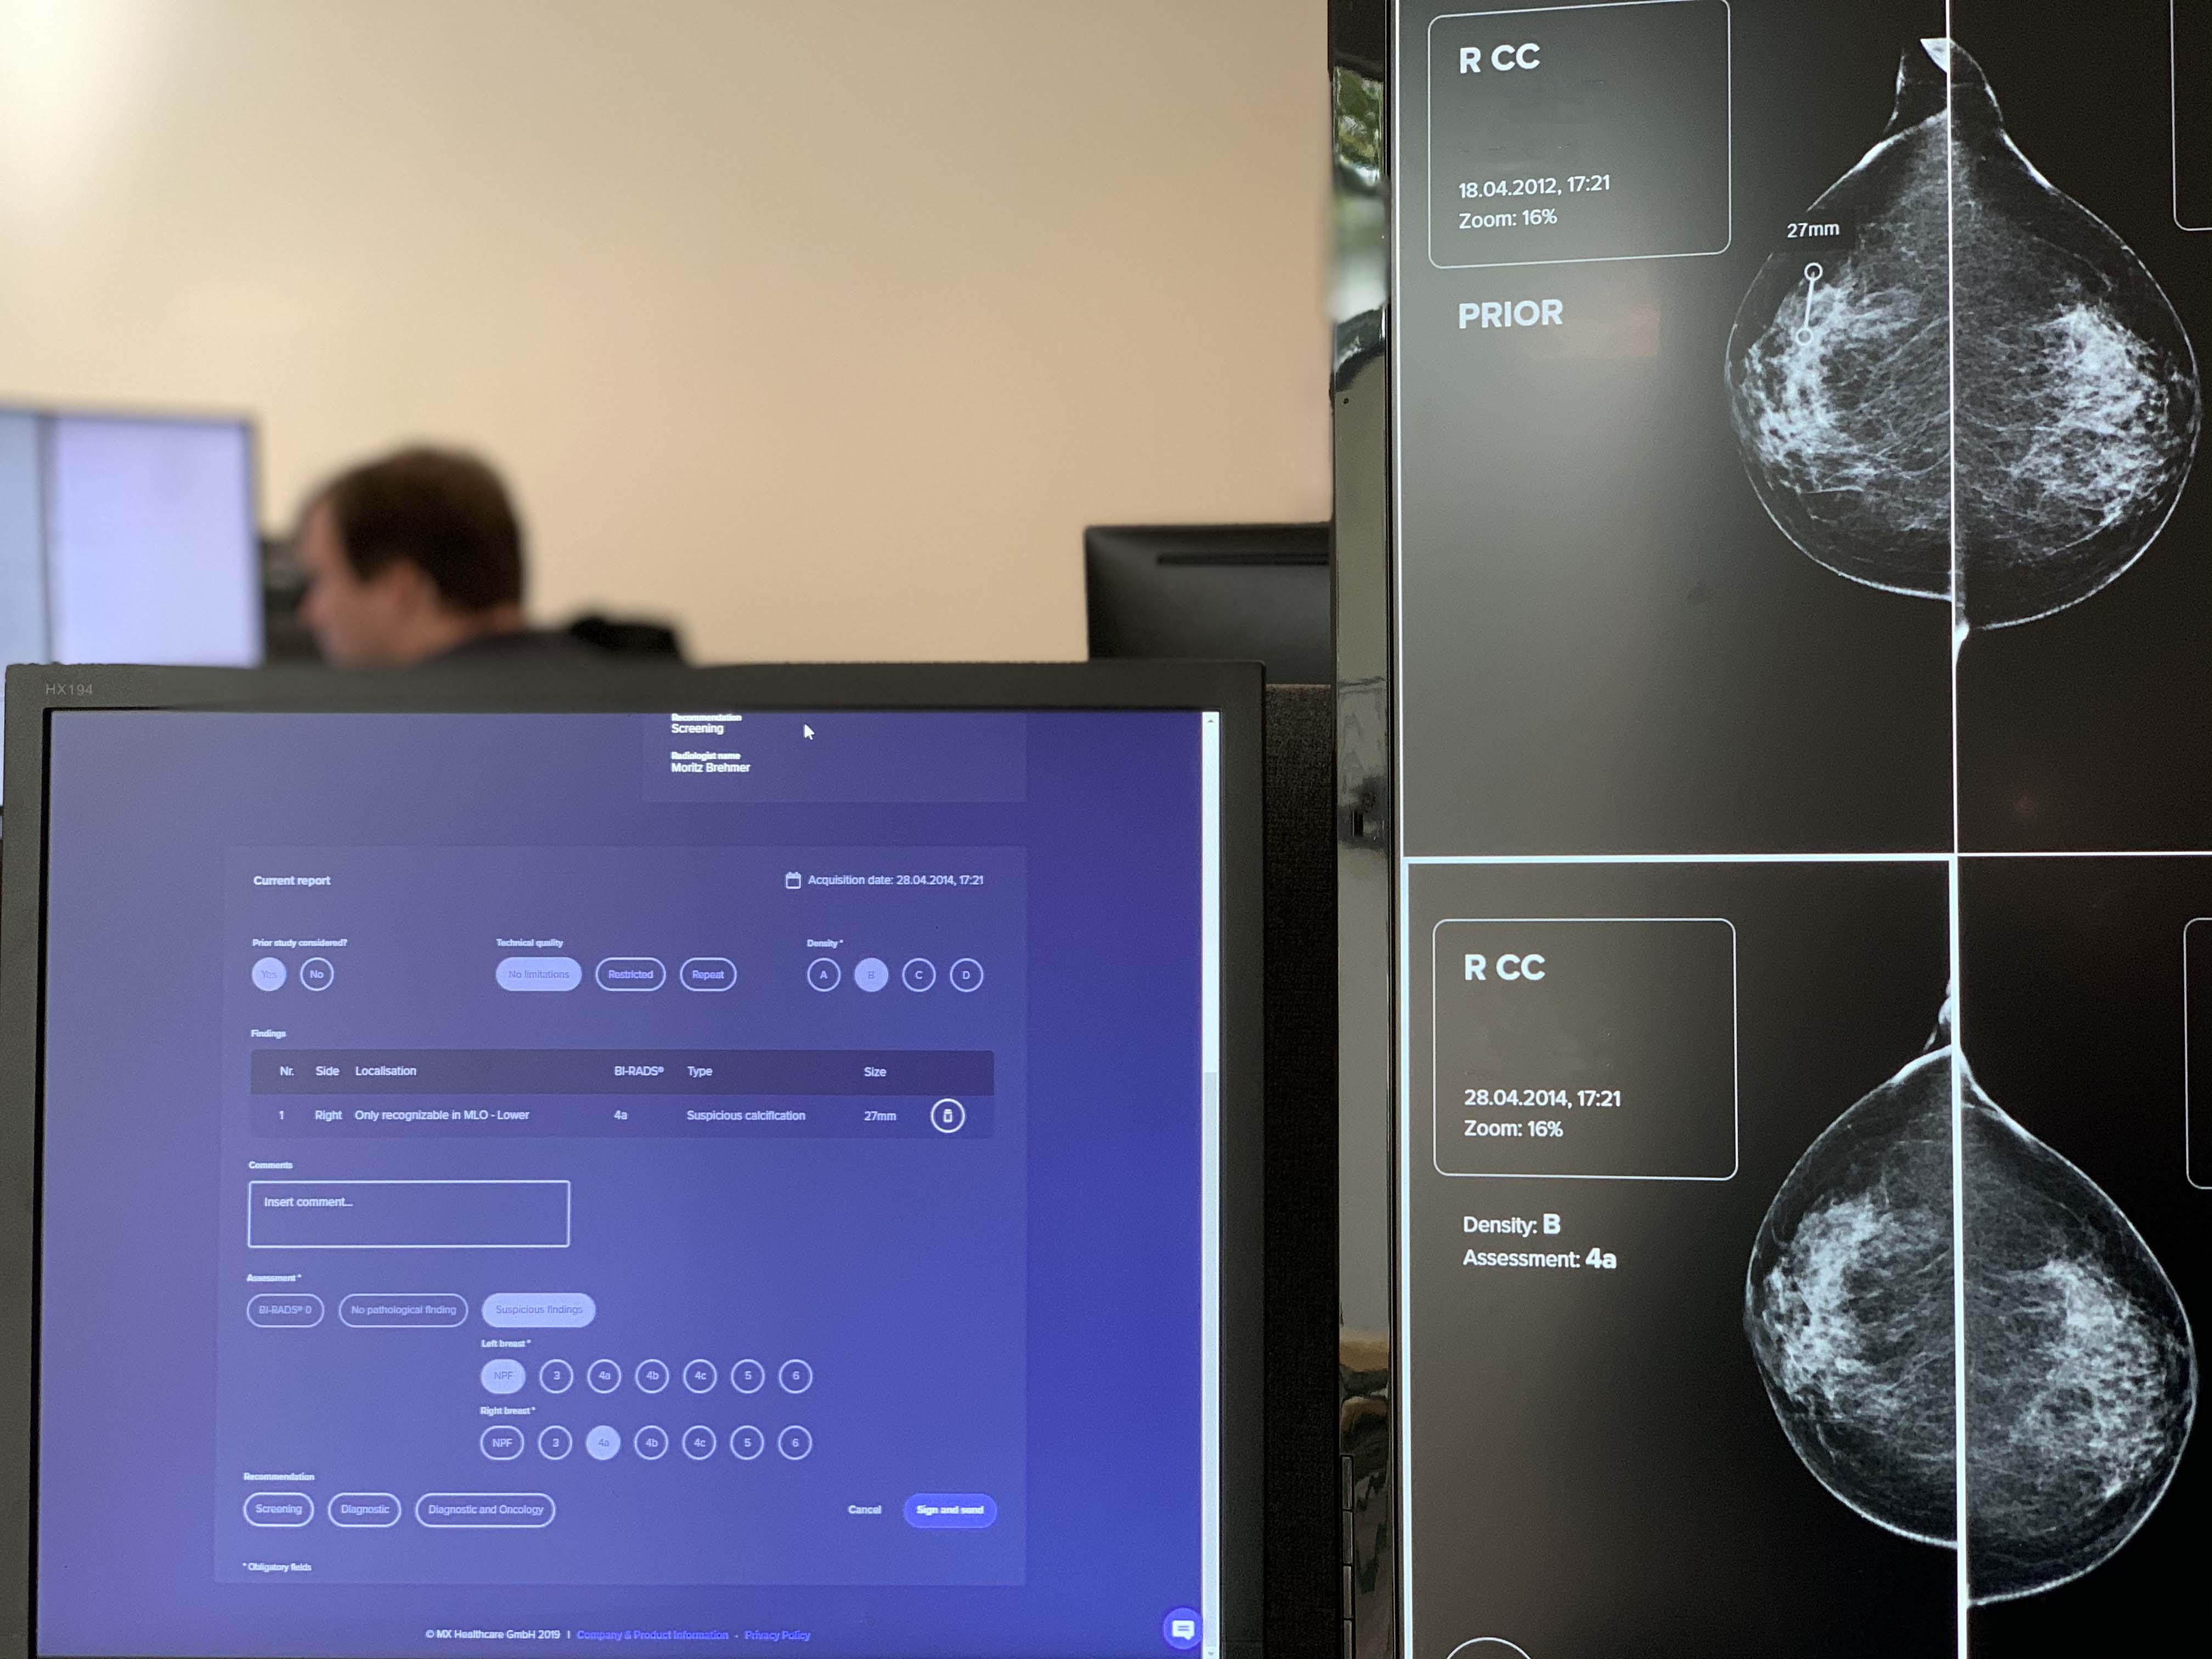 KI-Software zur  Brustkrebsvorsorge